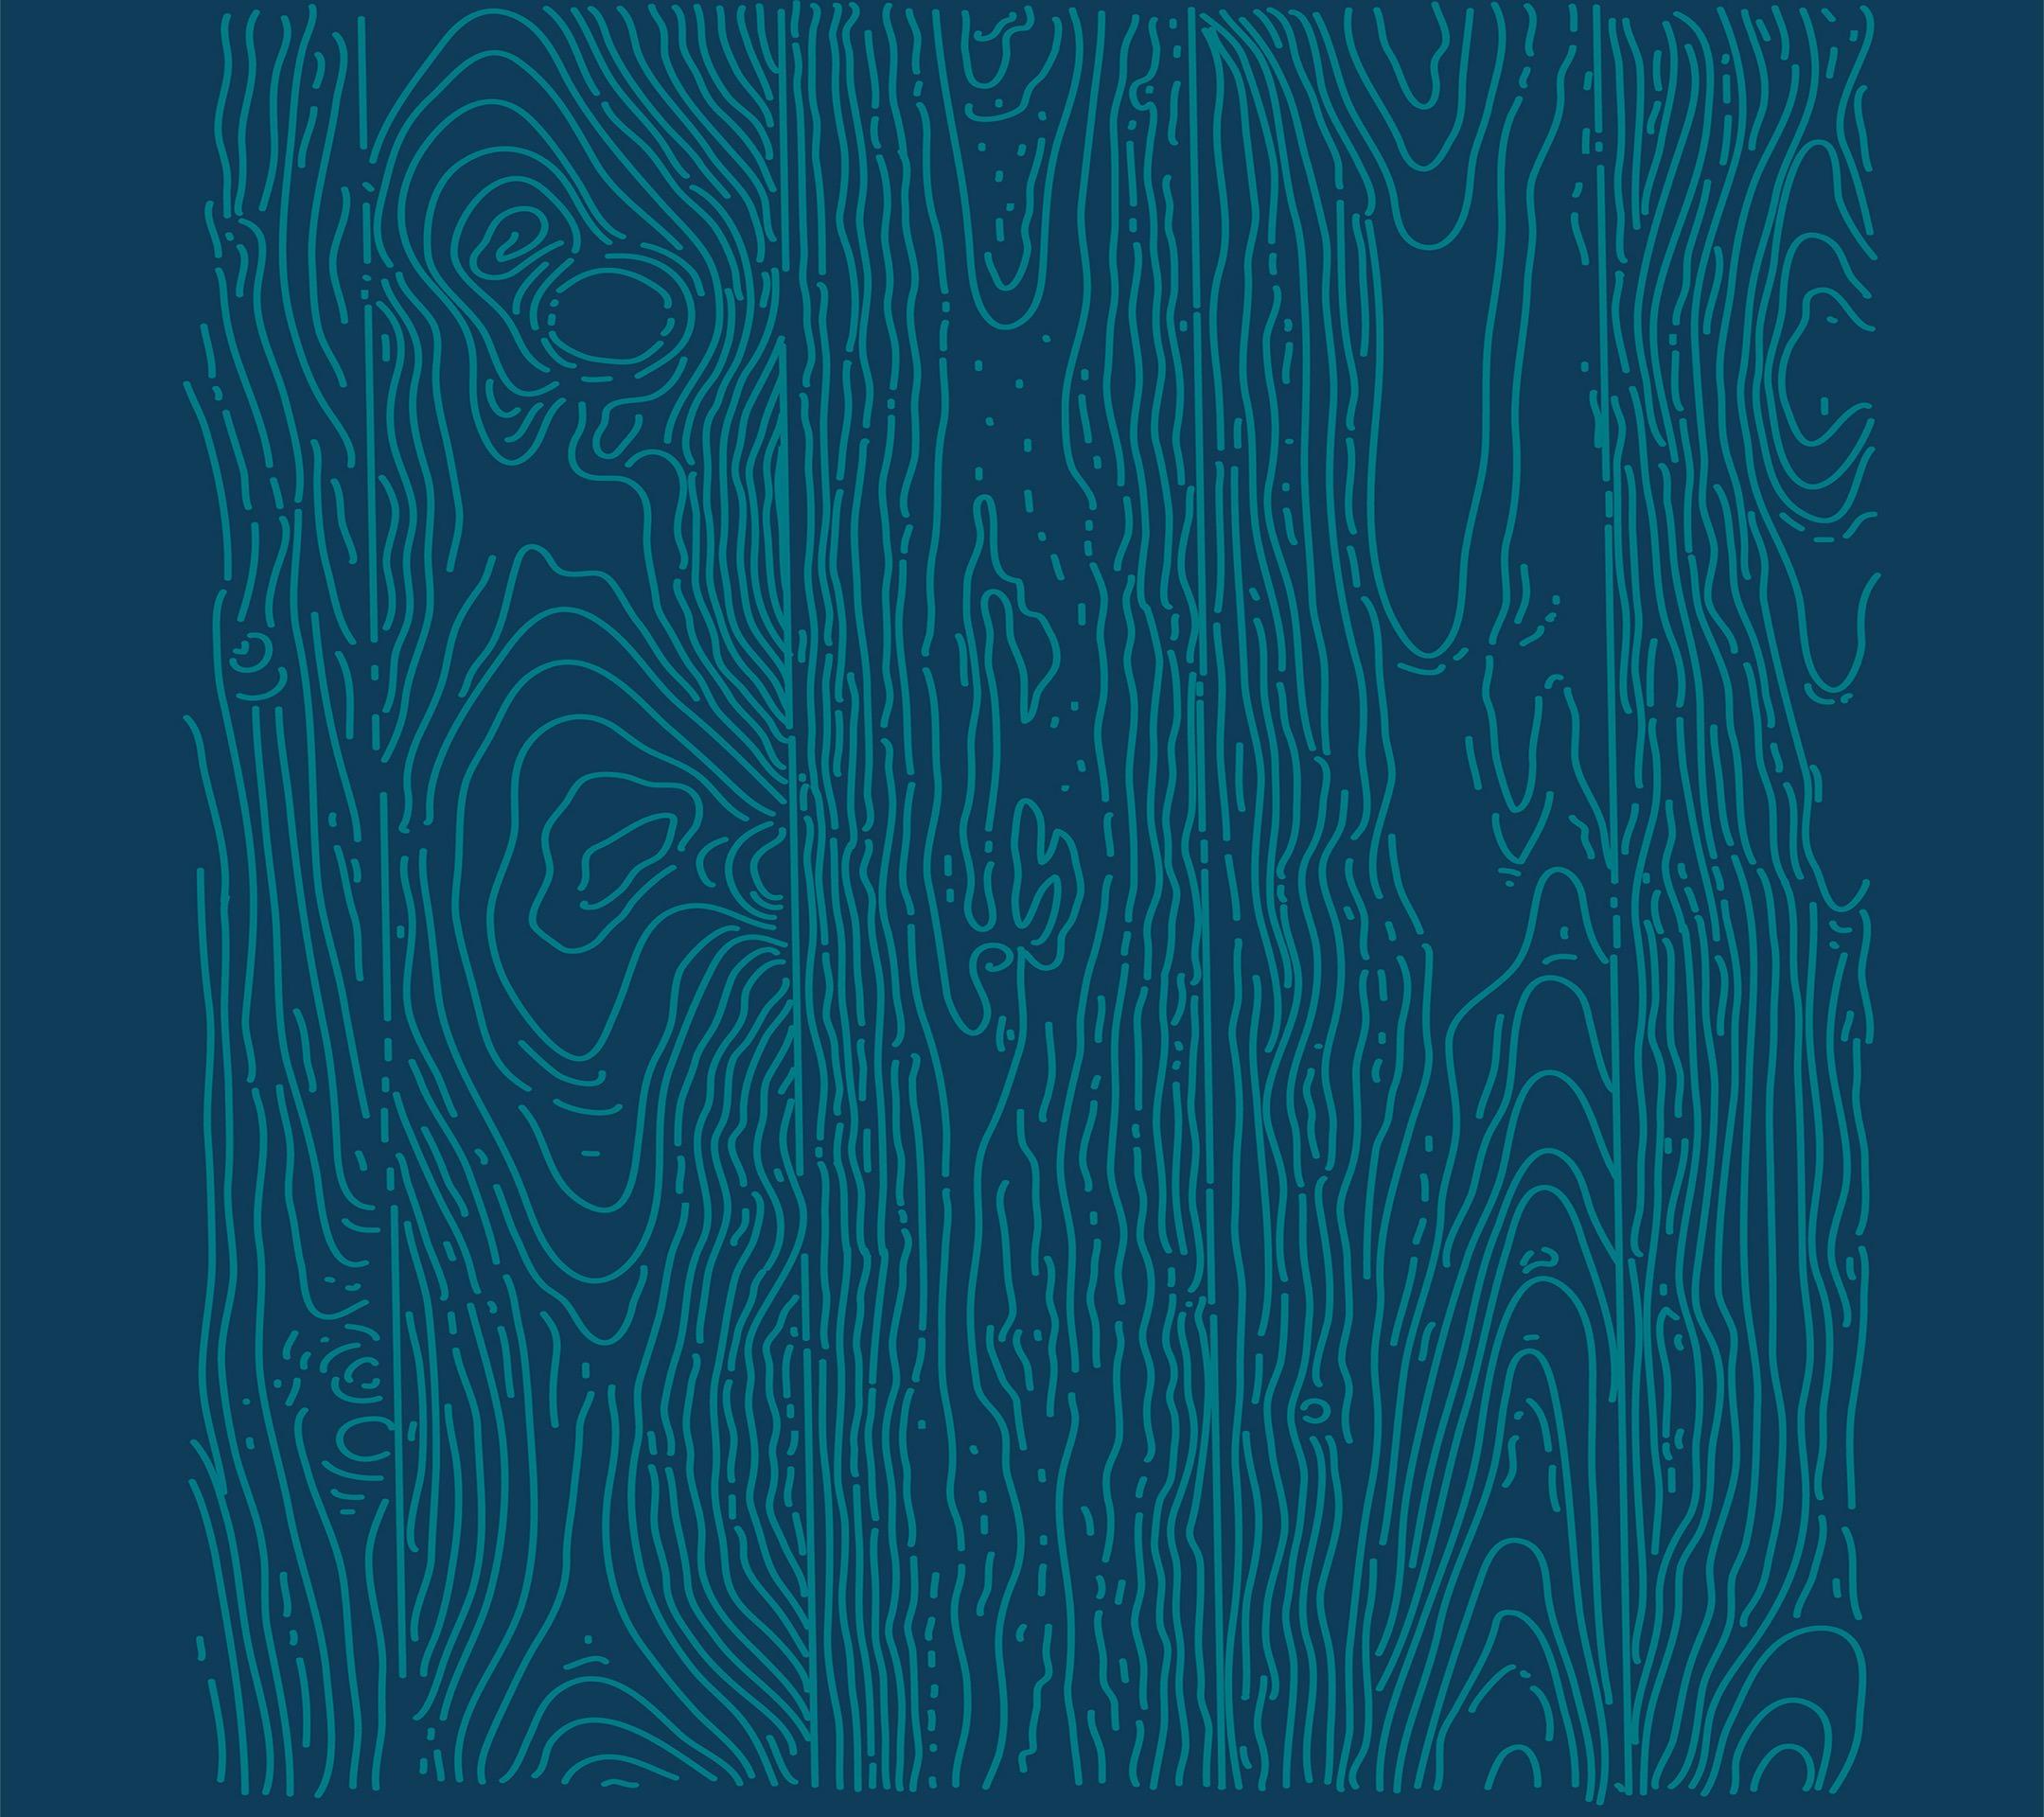 Smartphone Wallpaper 1080x1920: Illustrations Grain Blue Navy Blue